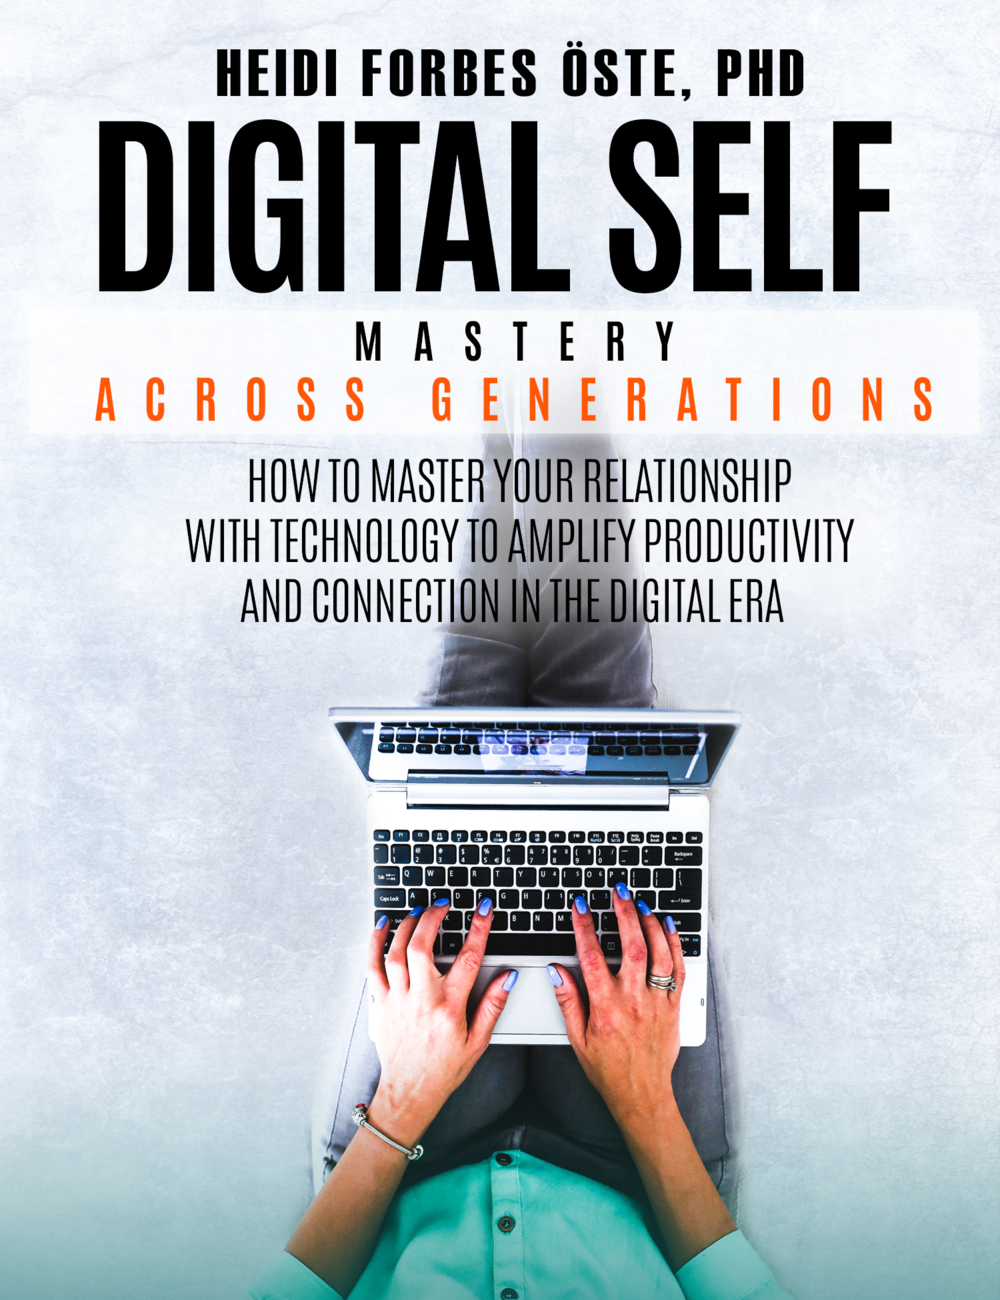 Digital Self Mastery Across Generations